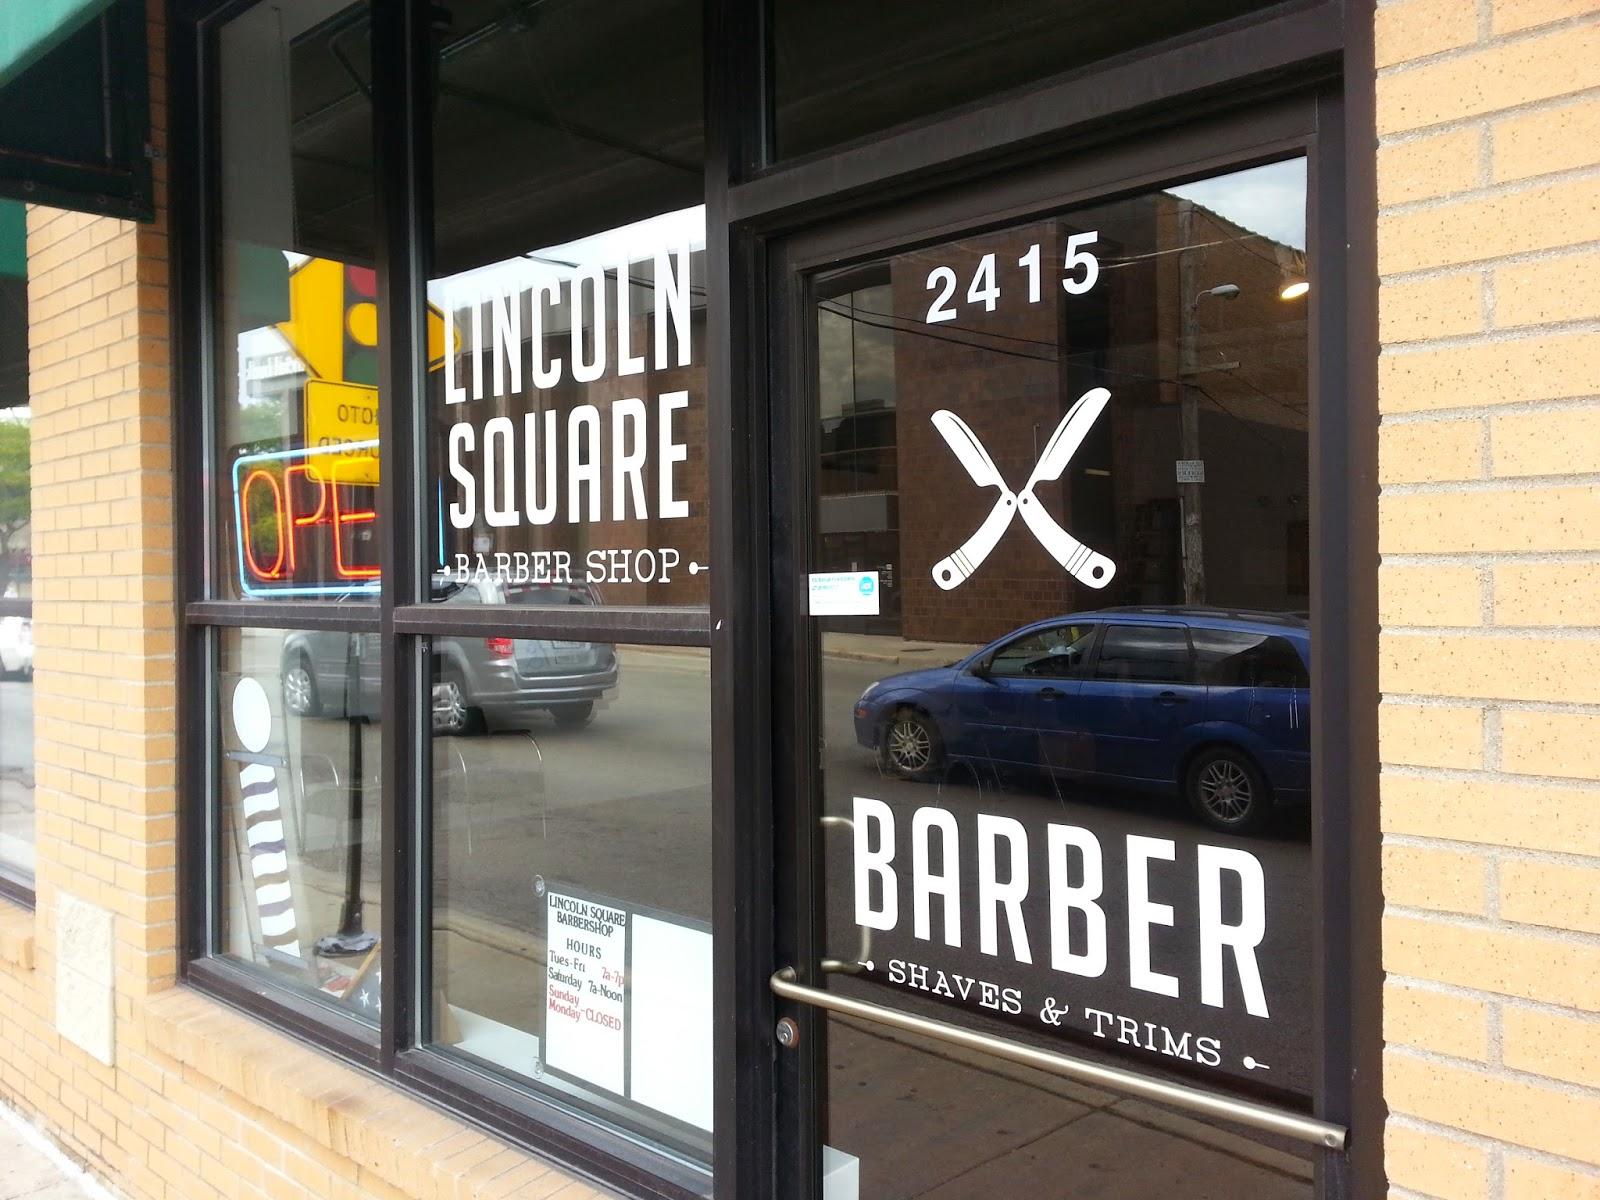 Barber Shop Chicago : Lincoln Square Barber Shop 2415 W Lawrence, Chicago